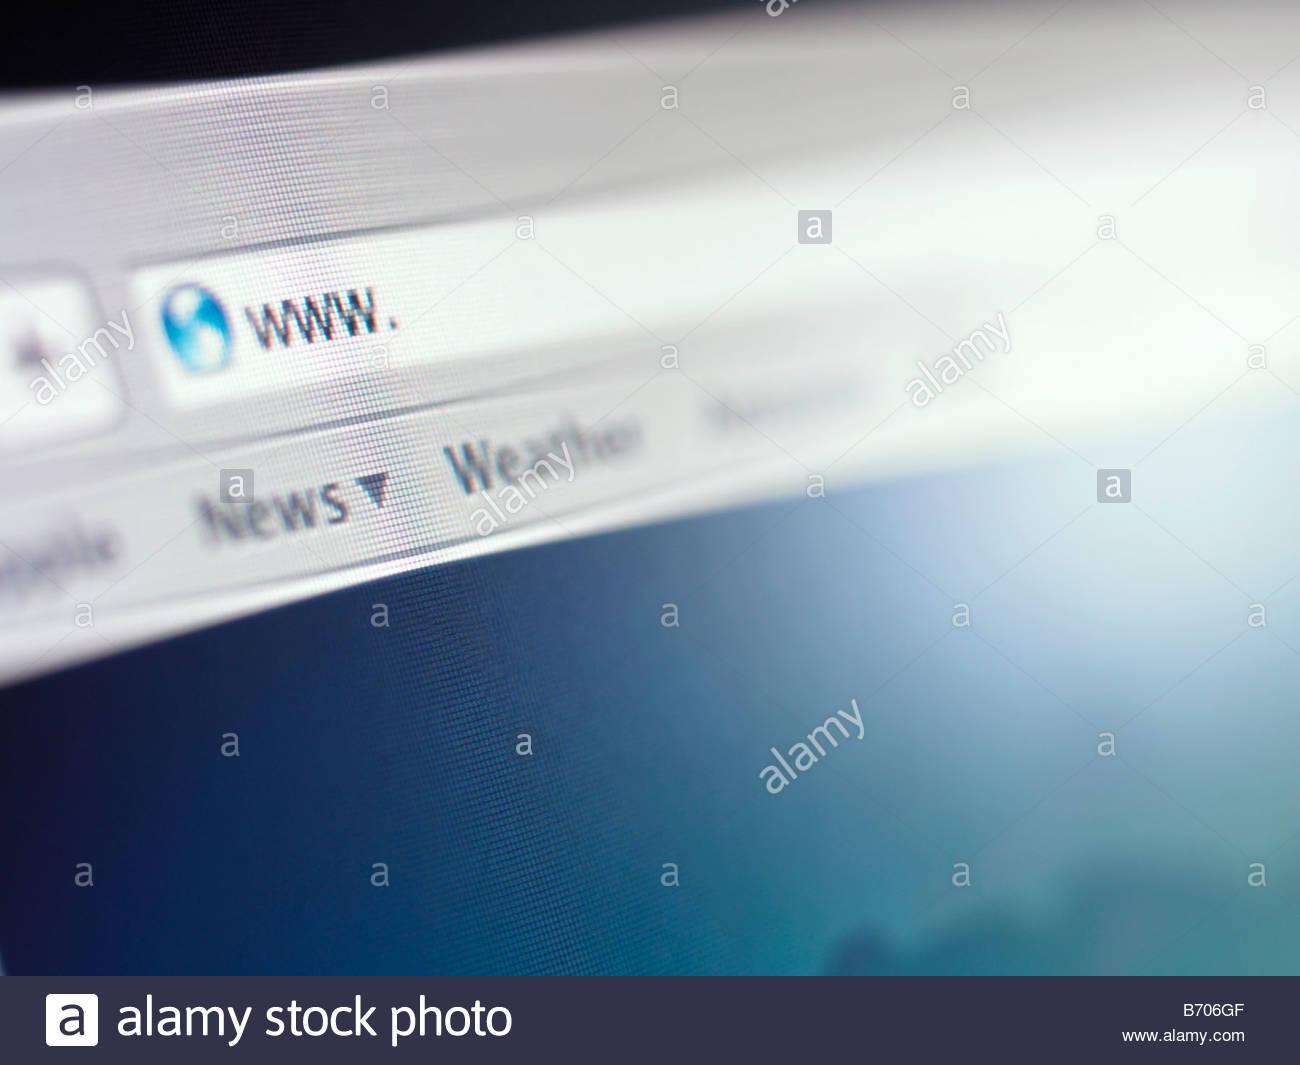 Cerca de la barra de direcciones del navegador de internet Imagen De Stock